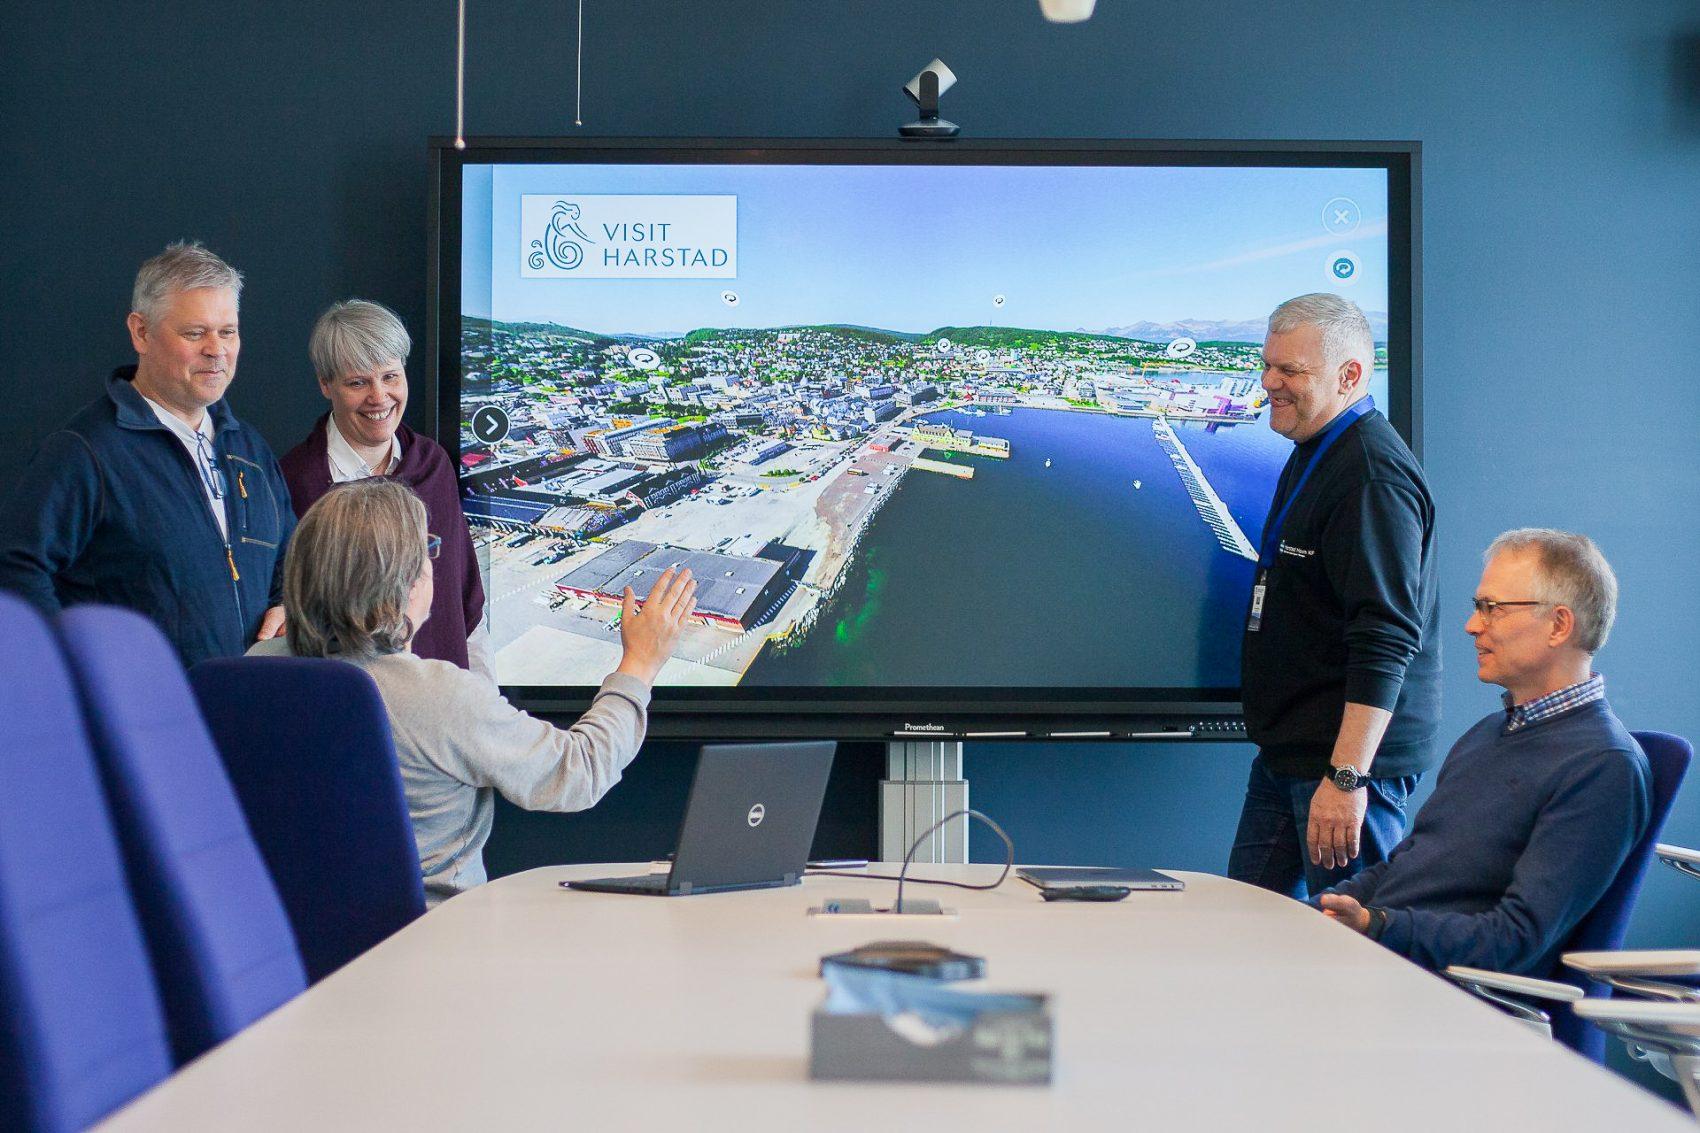 fra-pressemelding-om-visit-harstads-360-løsning